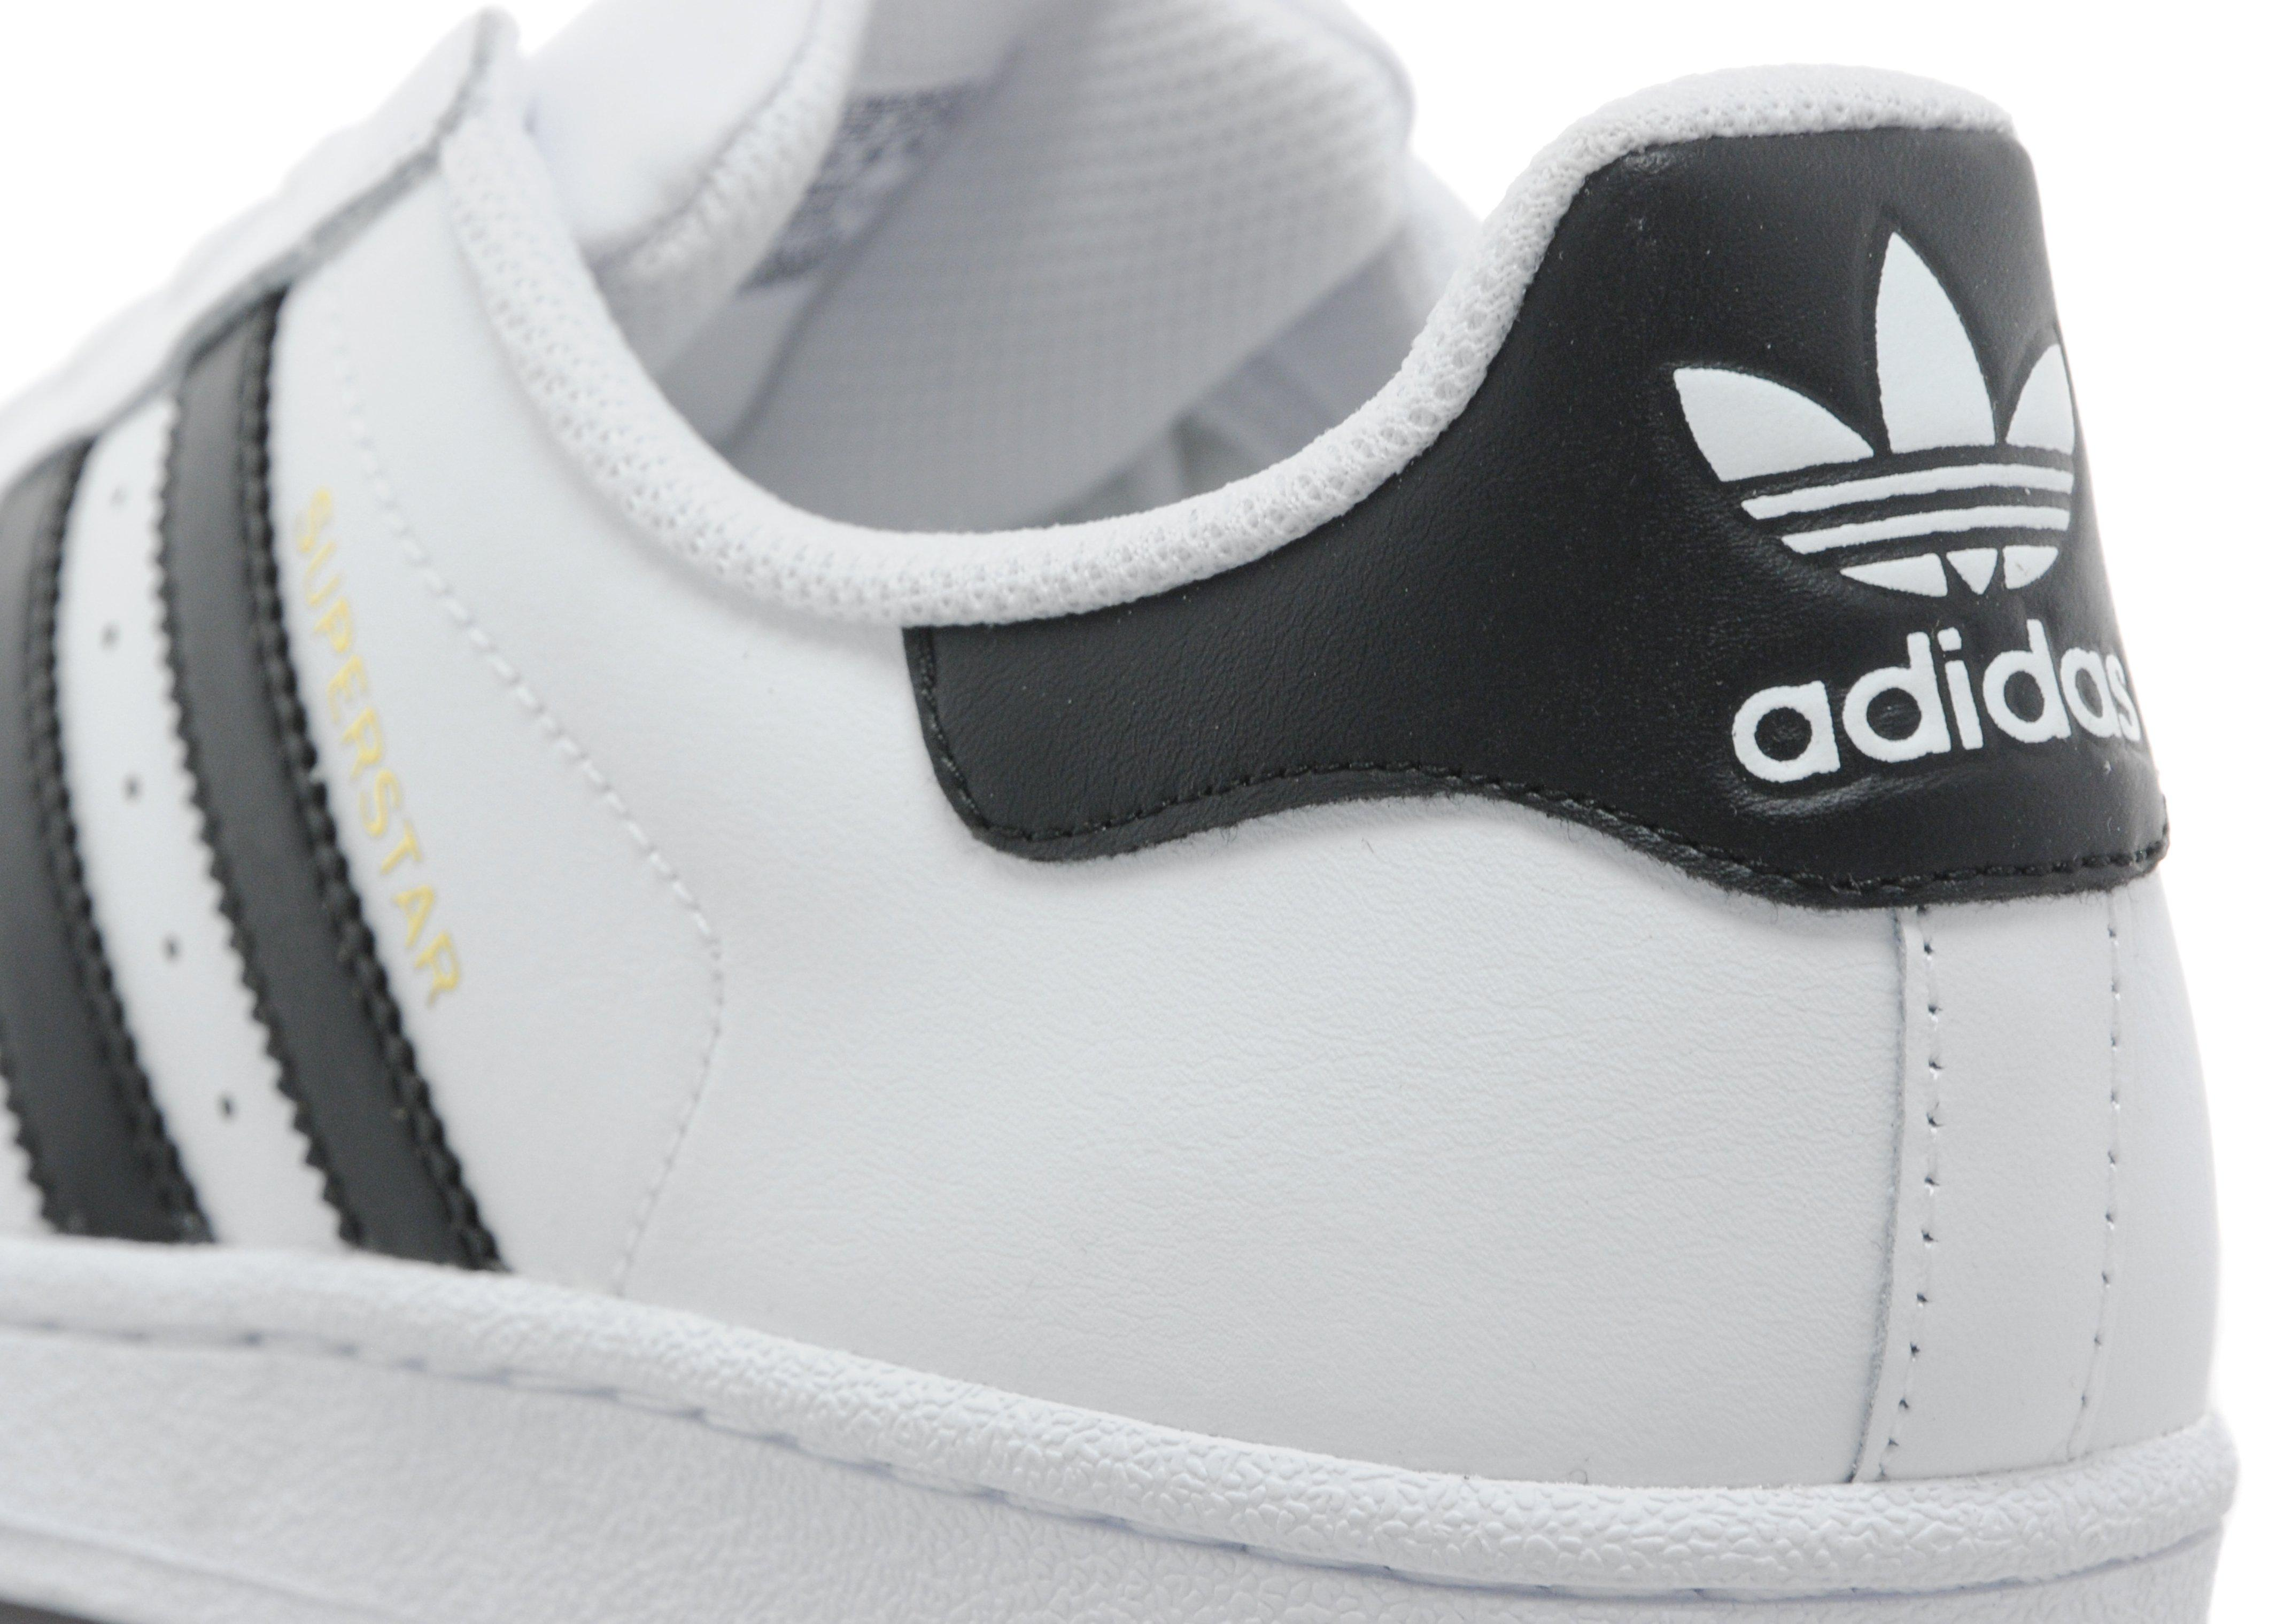 adidas originals superstar XPAWMGZ